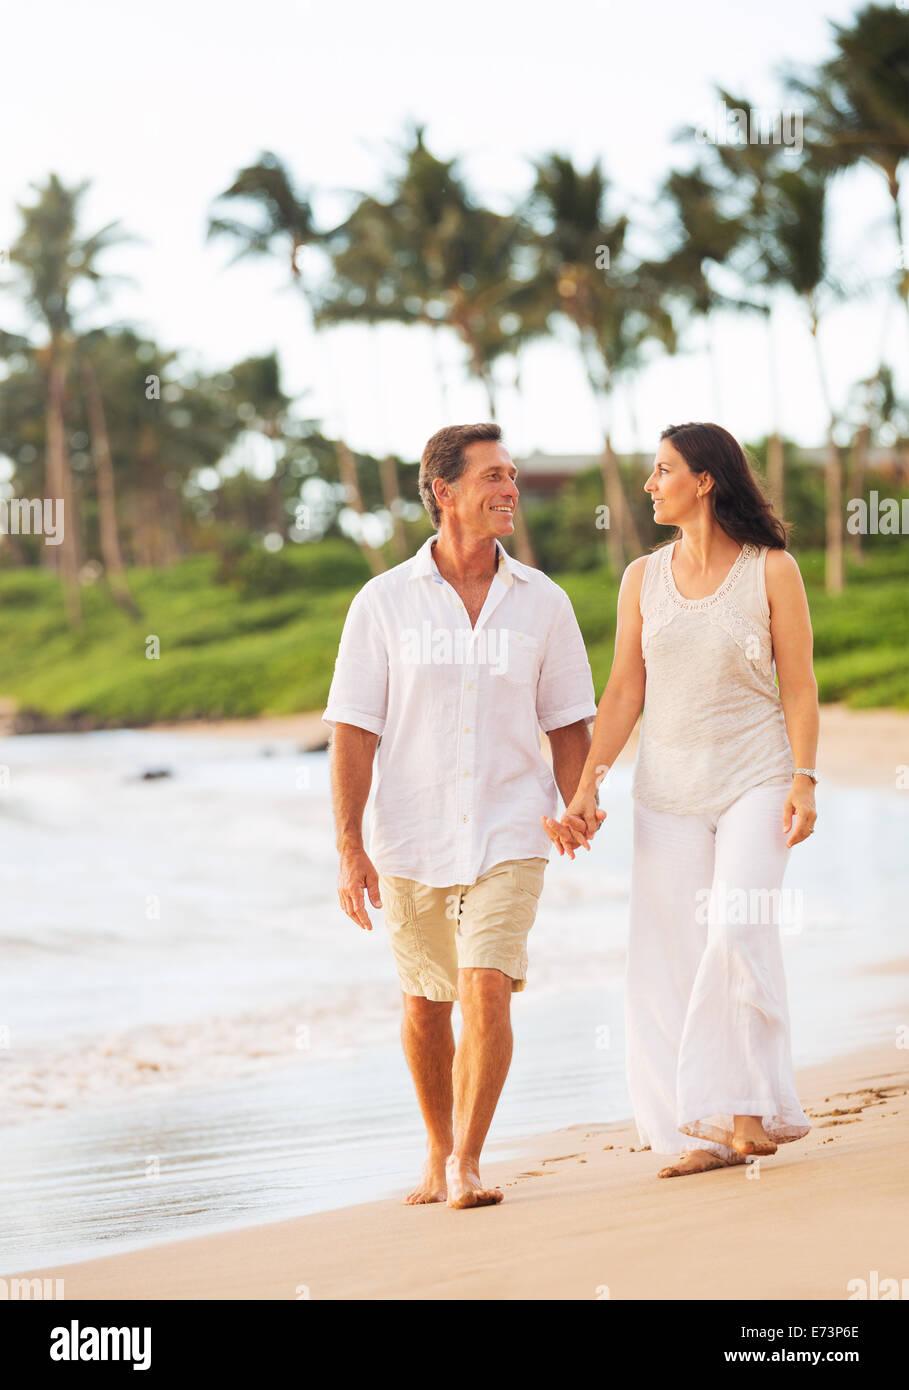 Romantic Mature Couple Enjoying Walk on the Beach - Stock Image